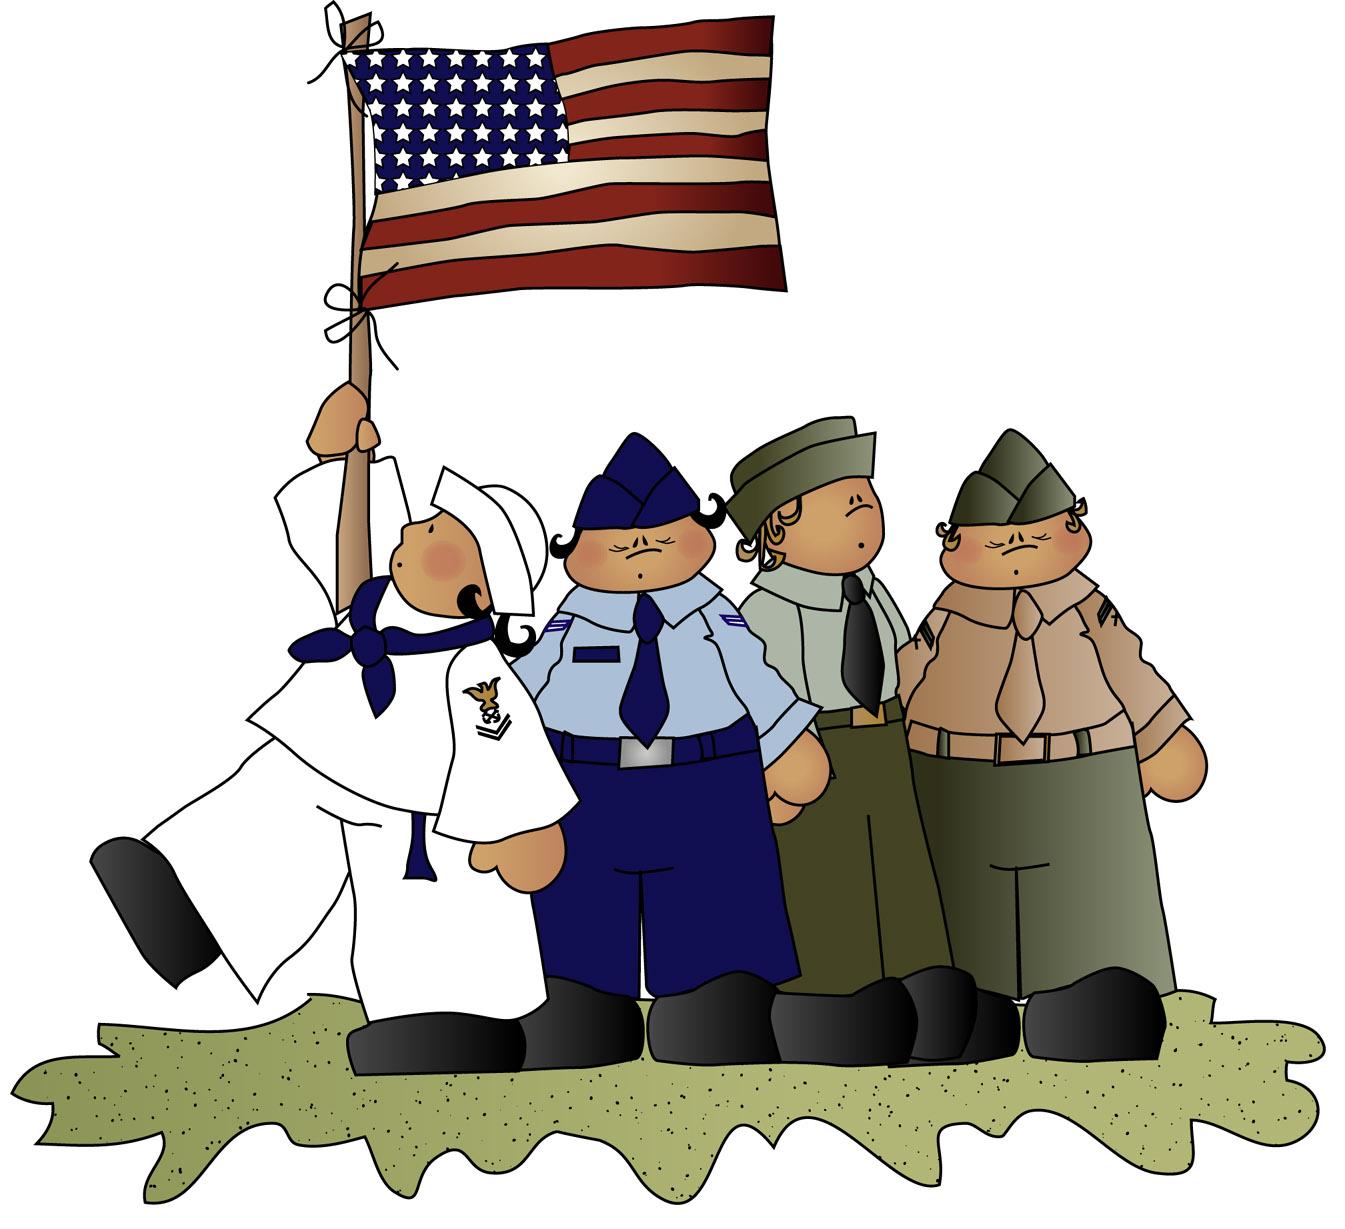 Veterans day clip art images 2 image.